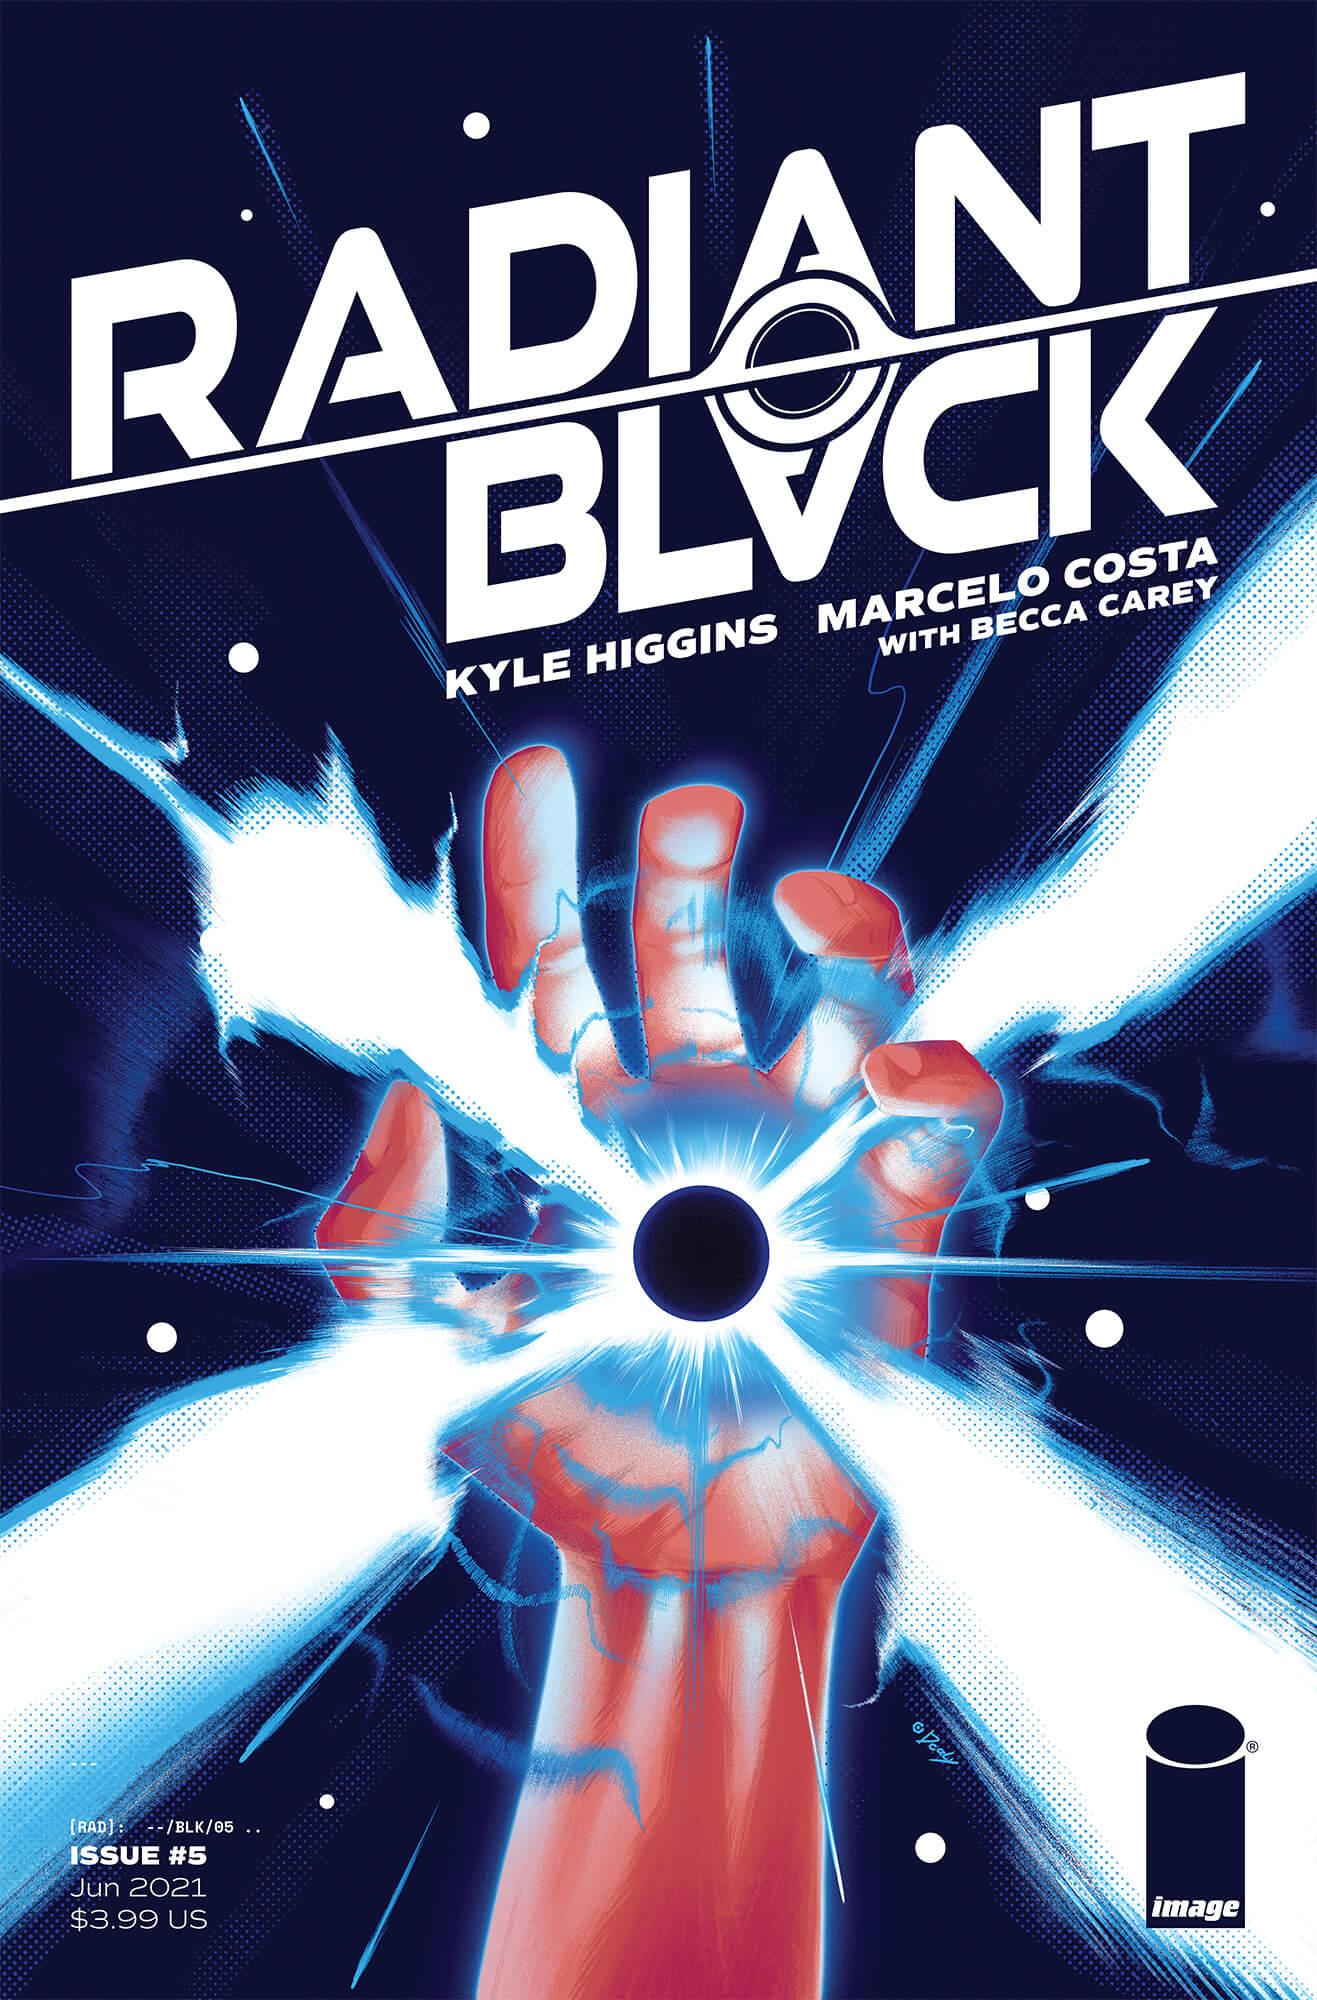 Radiant Black Cover Art Doaly